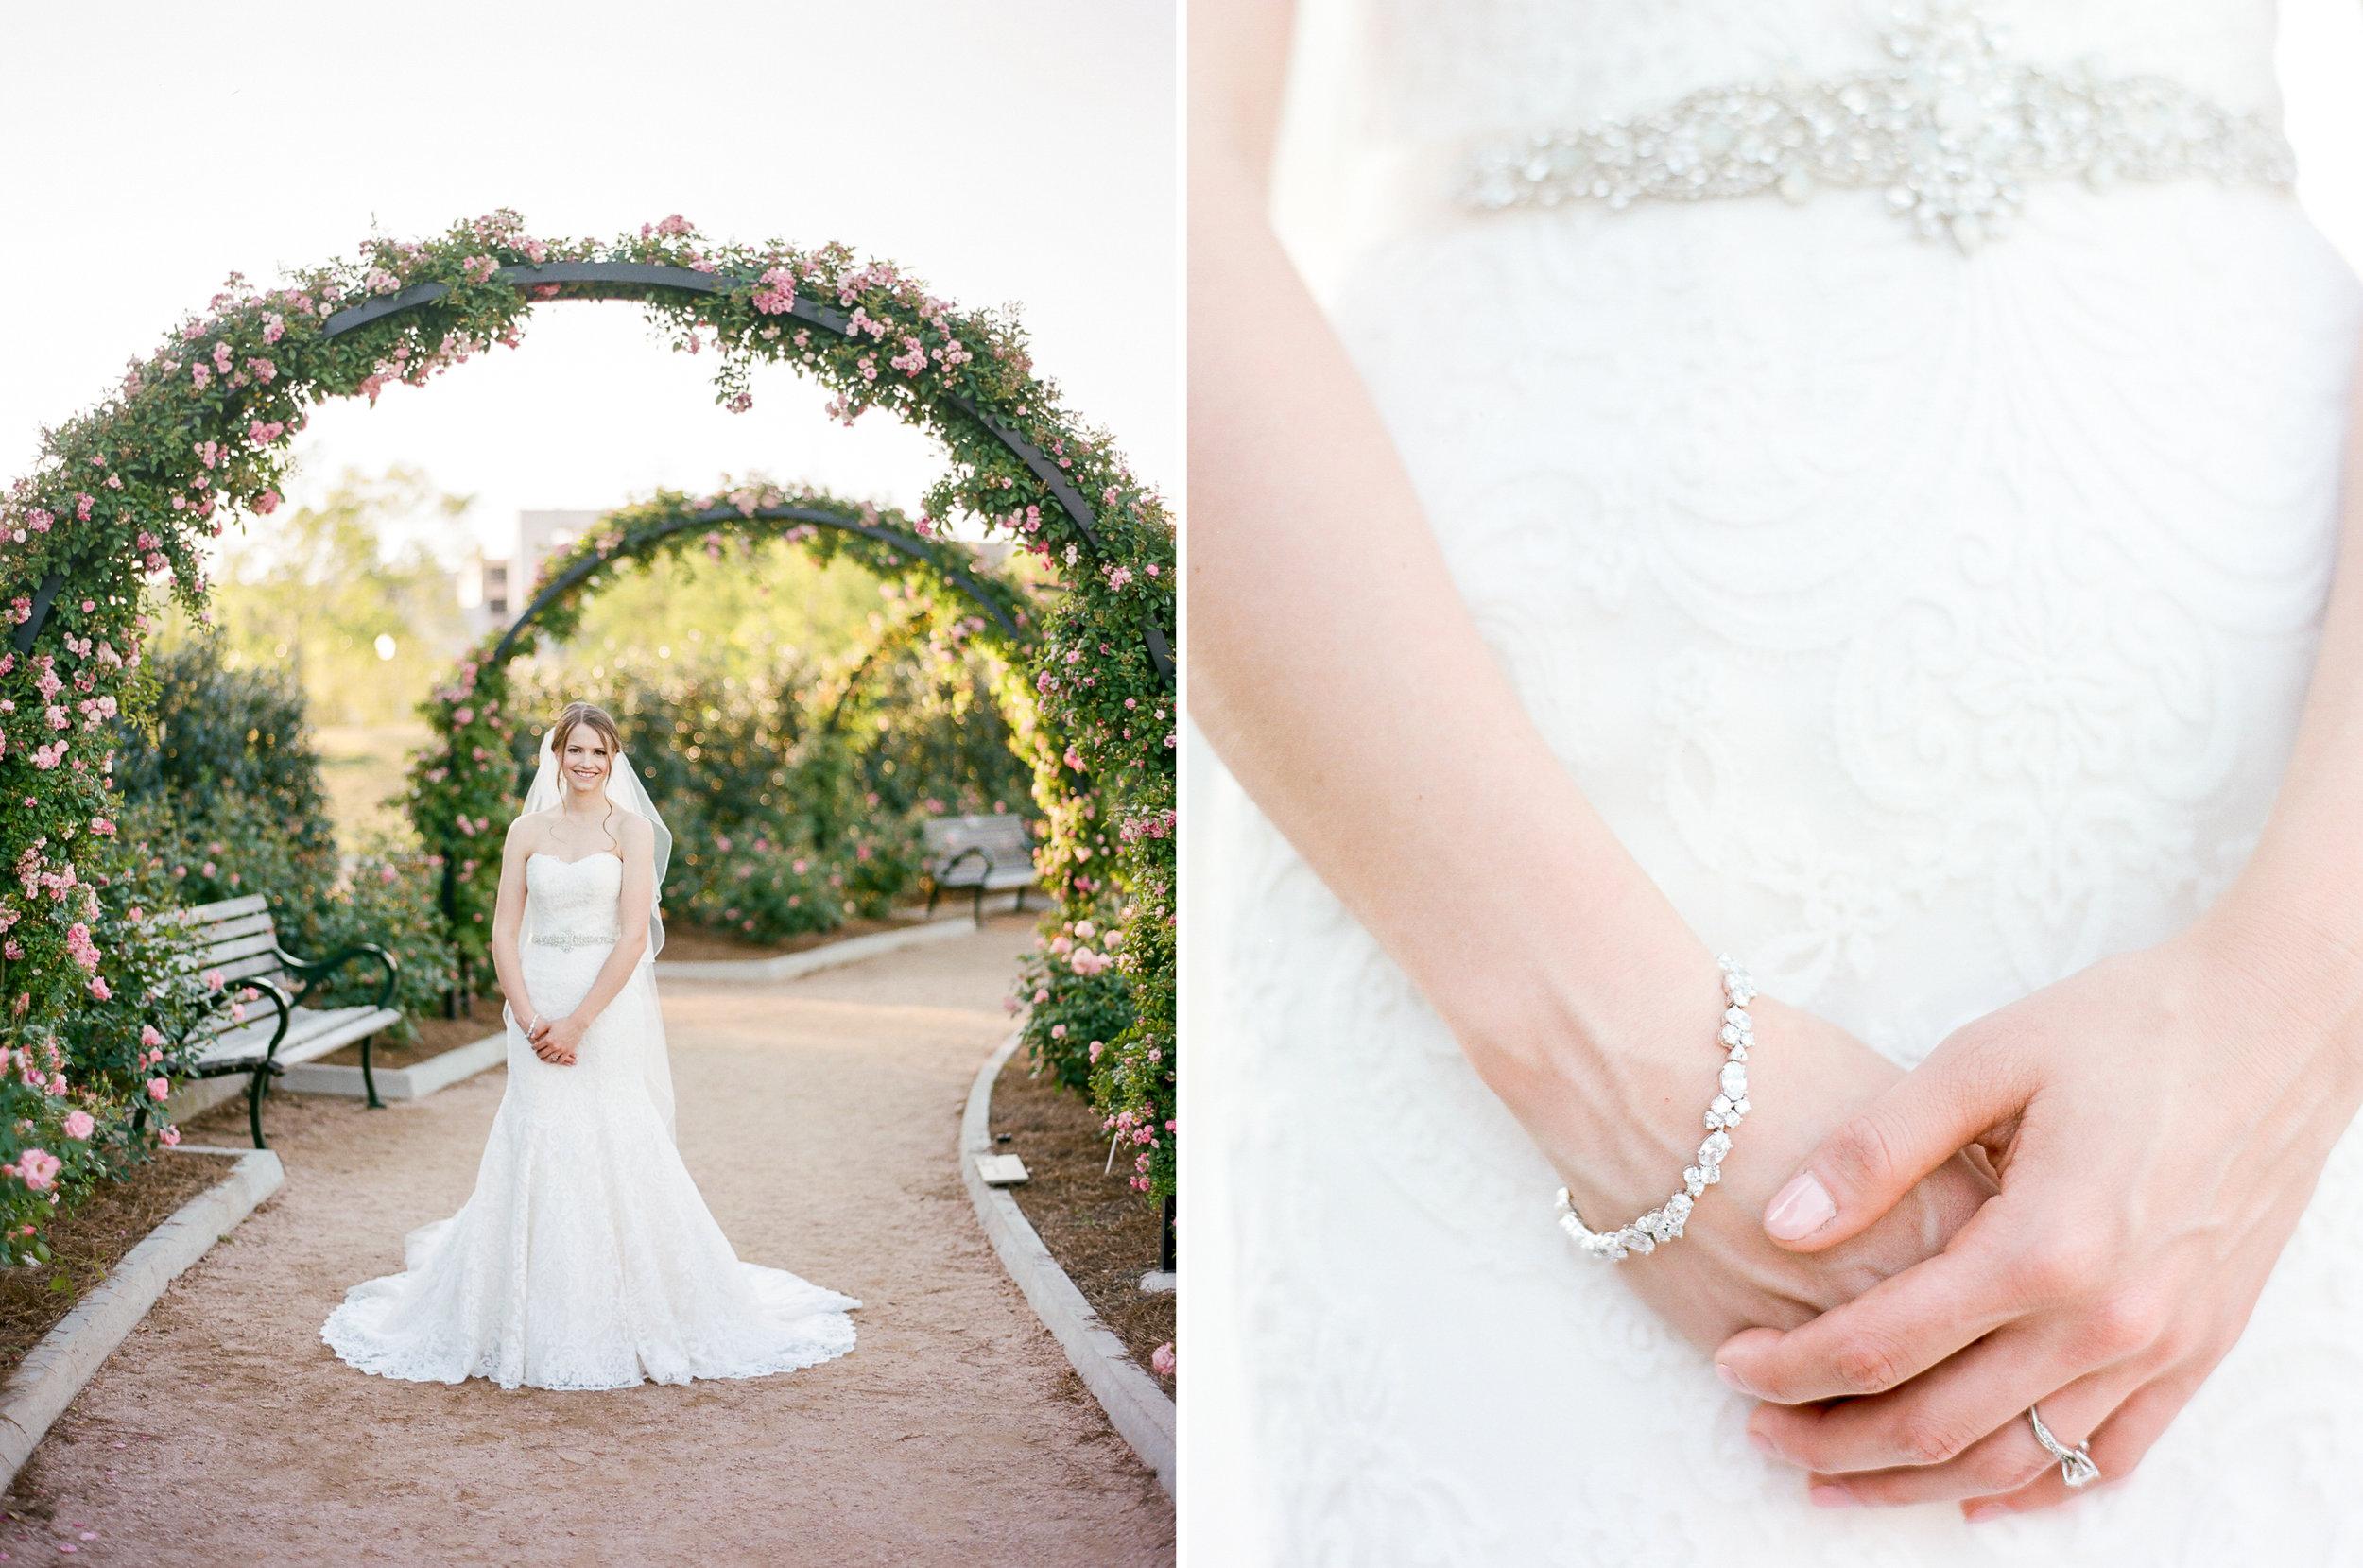 Houston-Wedding-Photographer-Film-Fine-Art-Bridals-Dana Fernandez-Photography-105.jpg